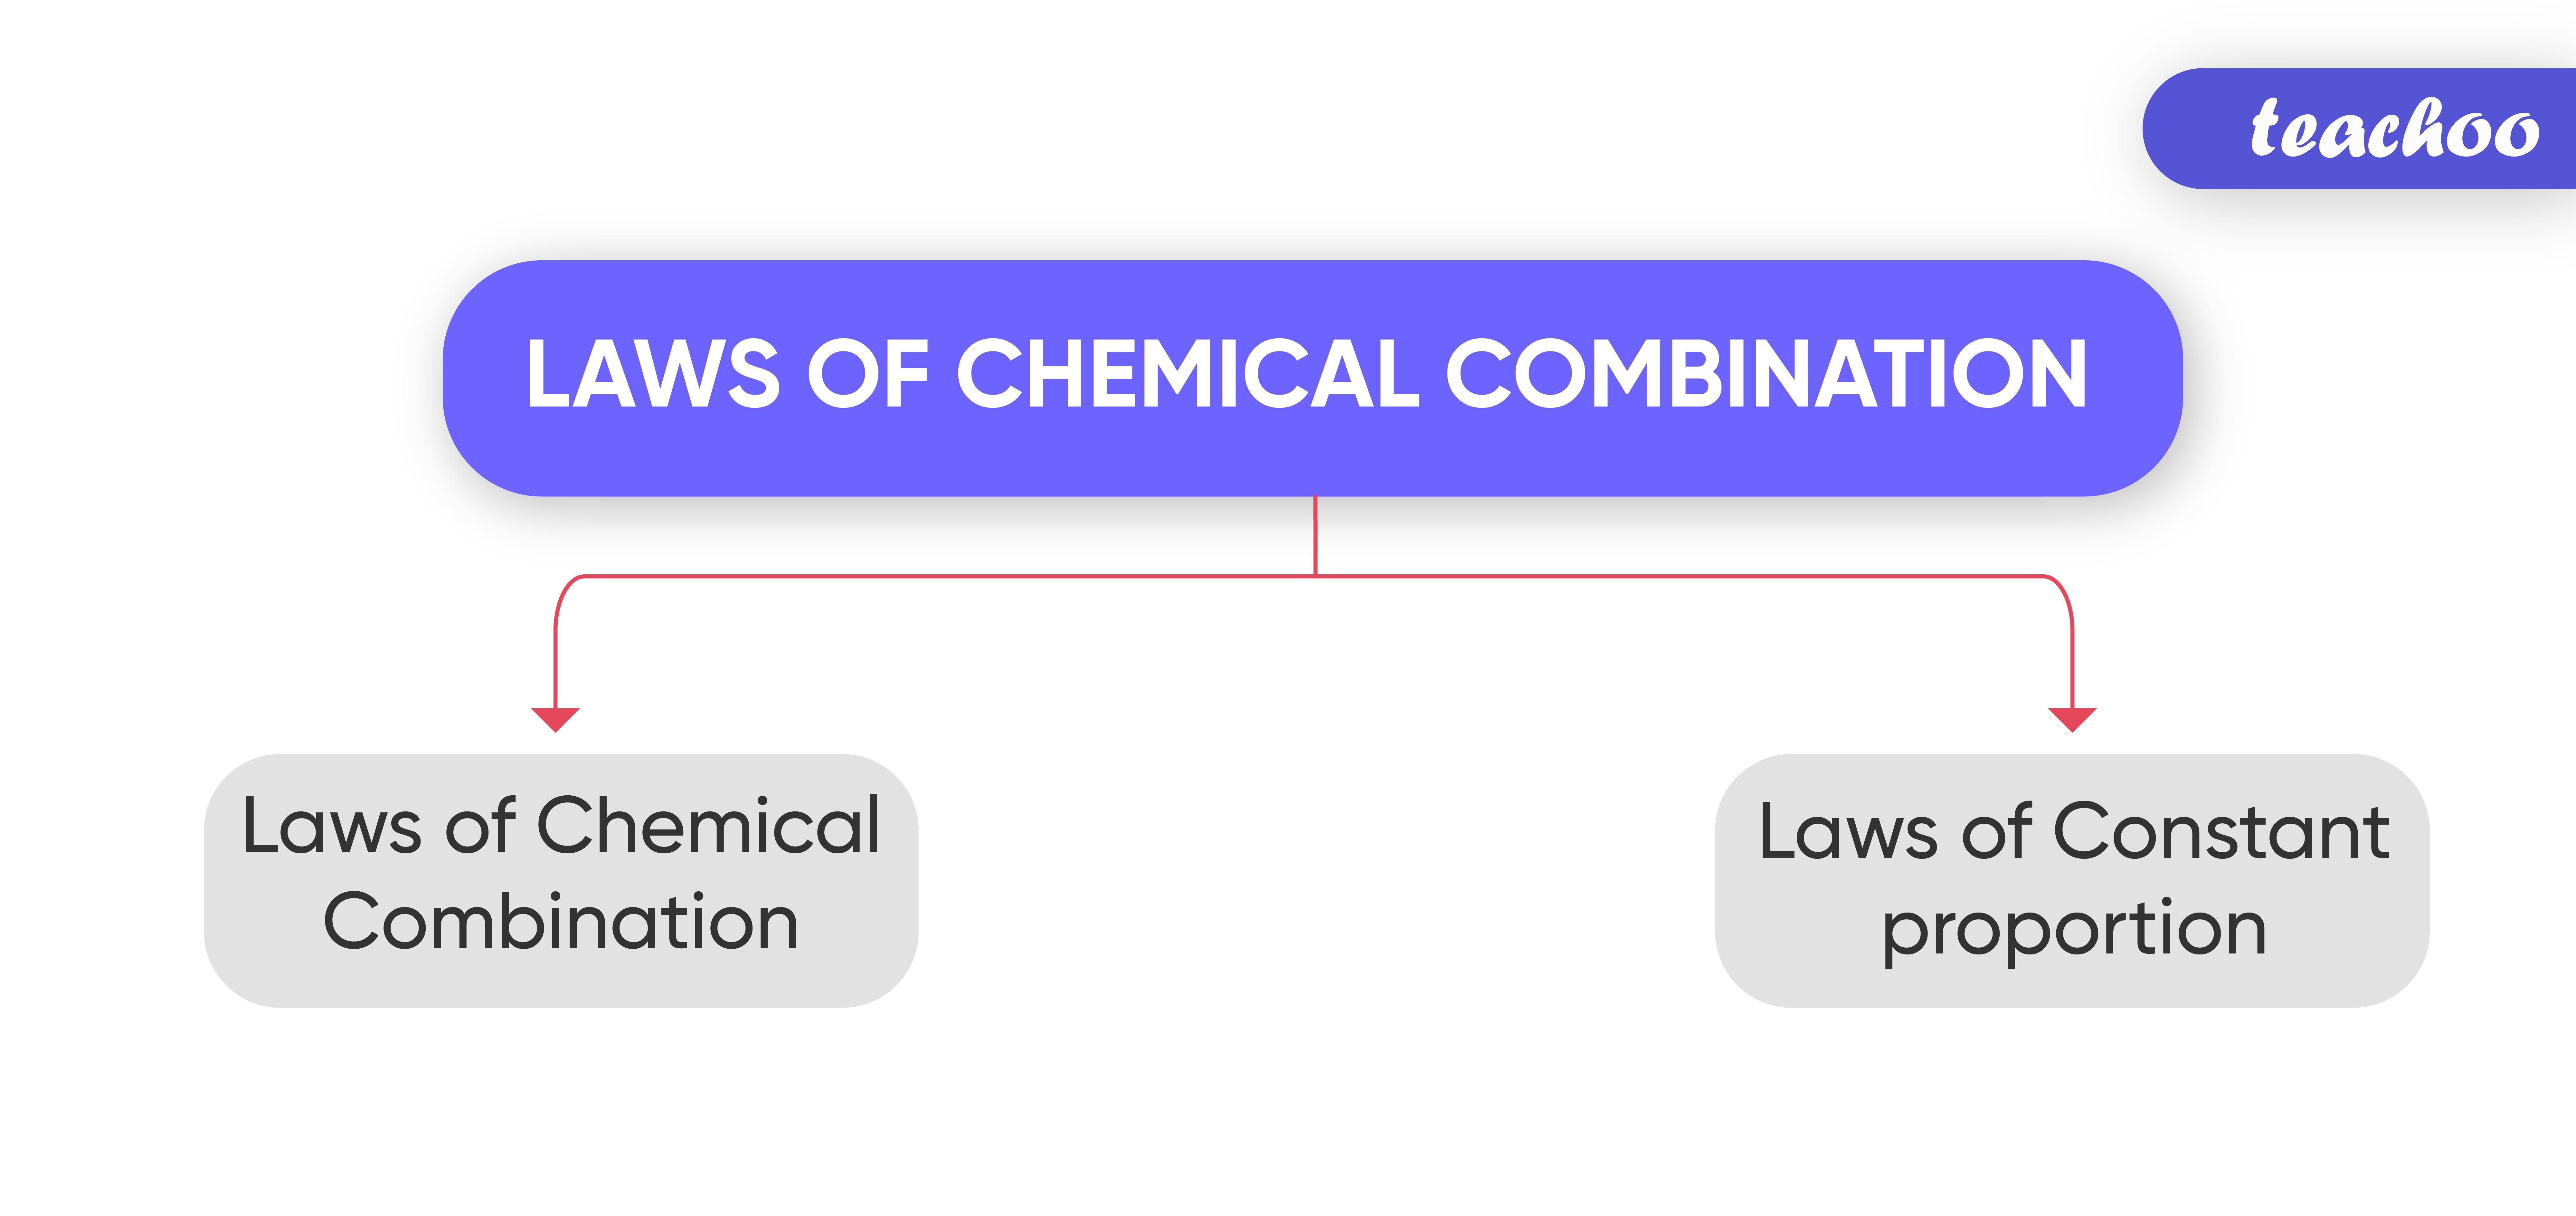 Laws of Chemical Combination-Teachoo.jpg